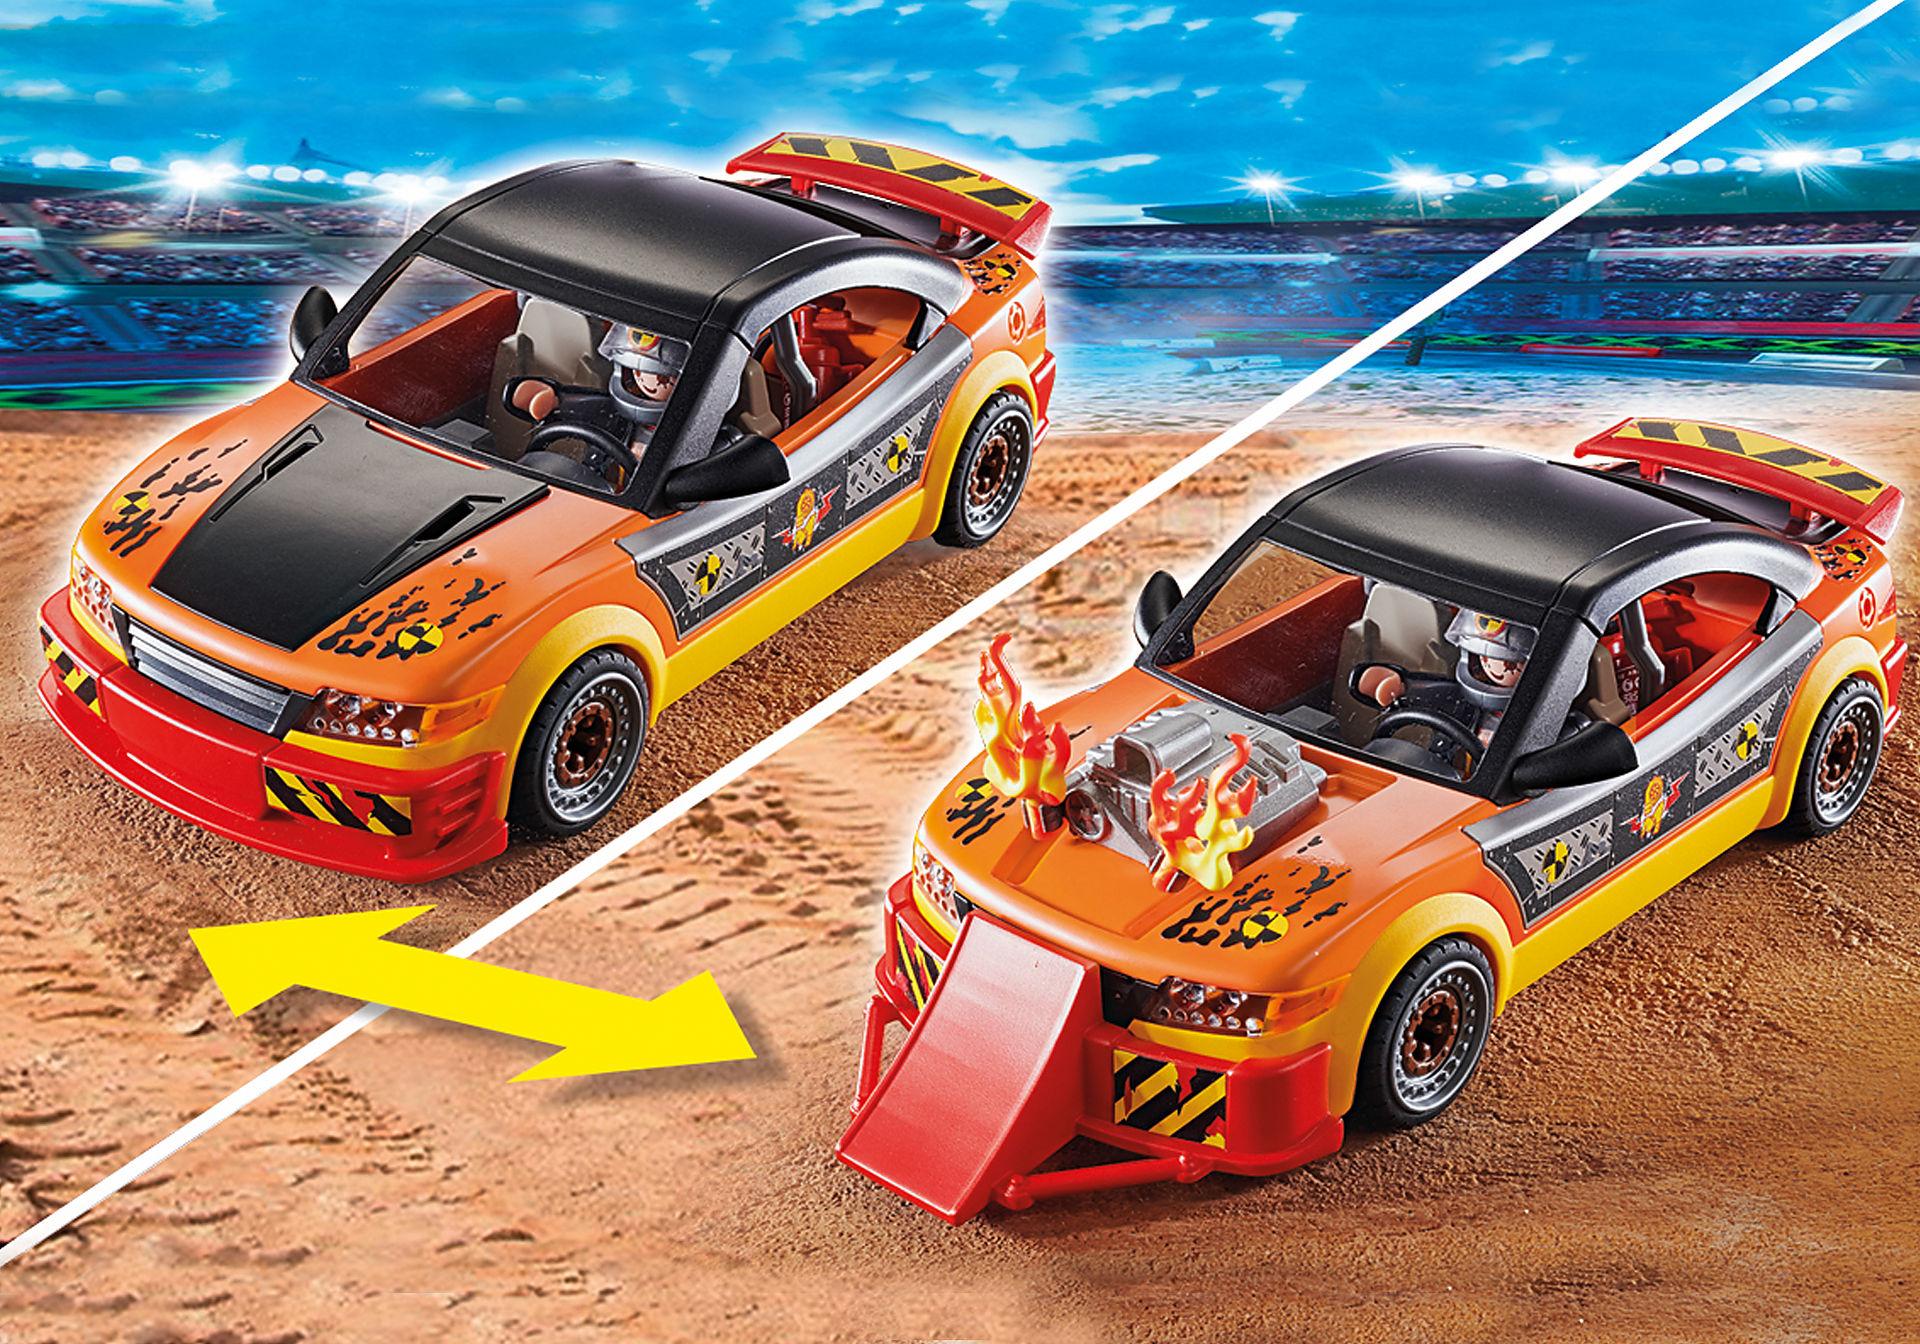 70551 Crash Car zoom image5